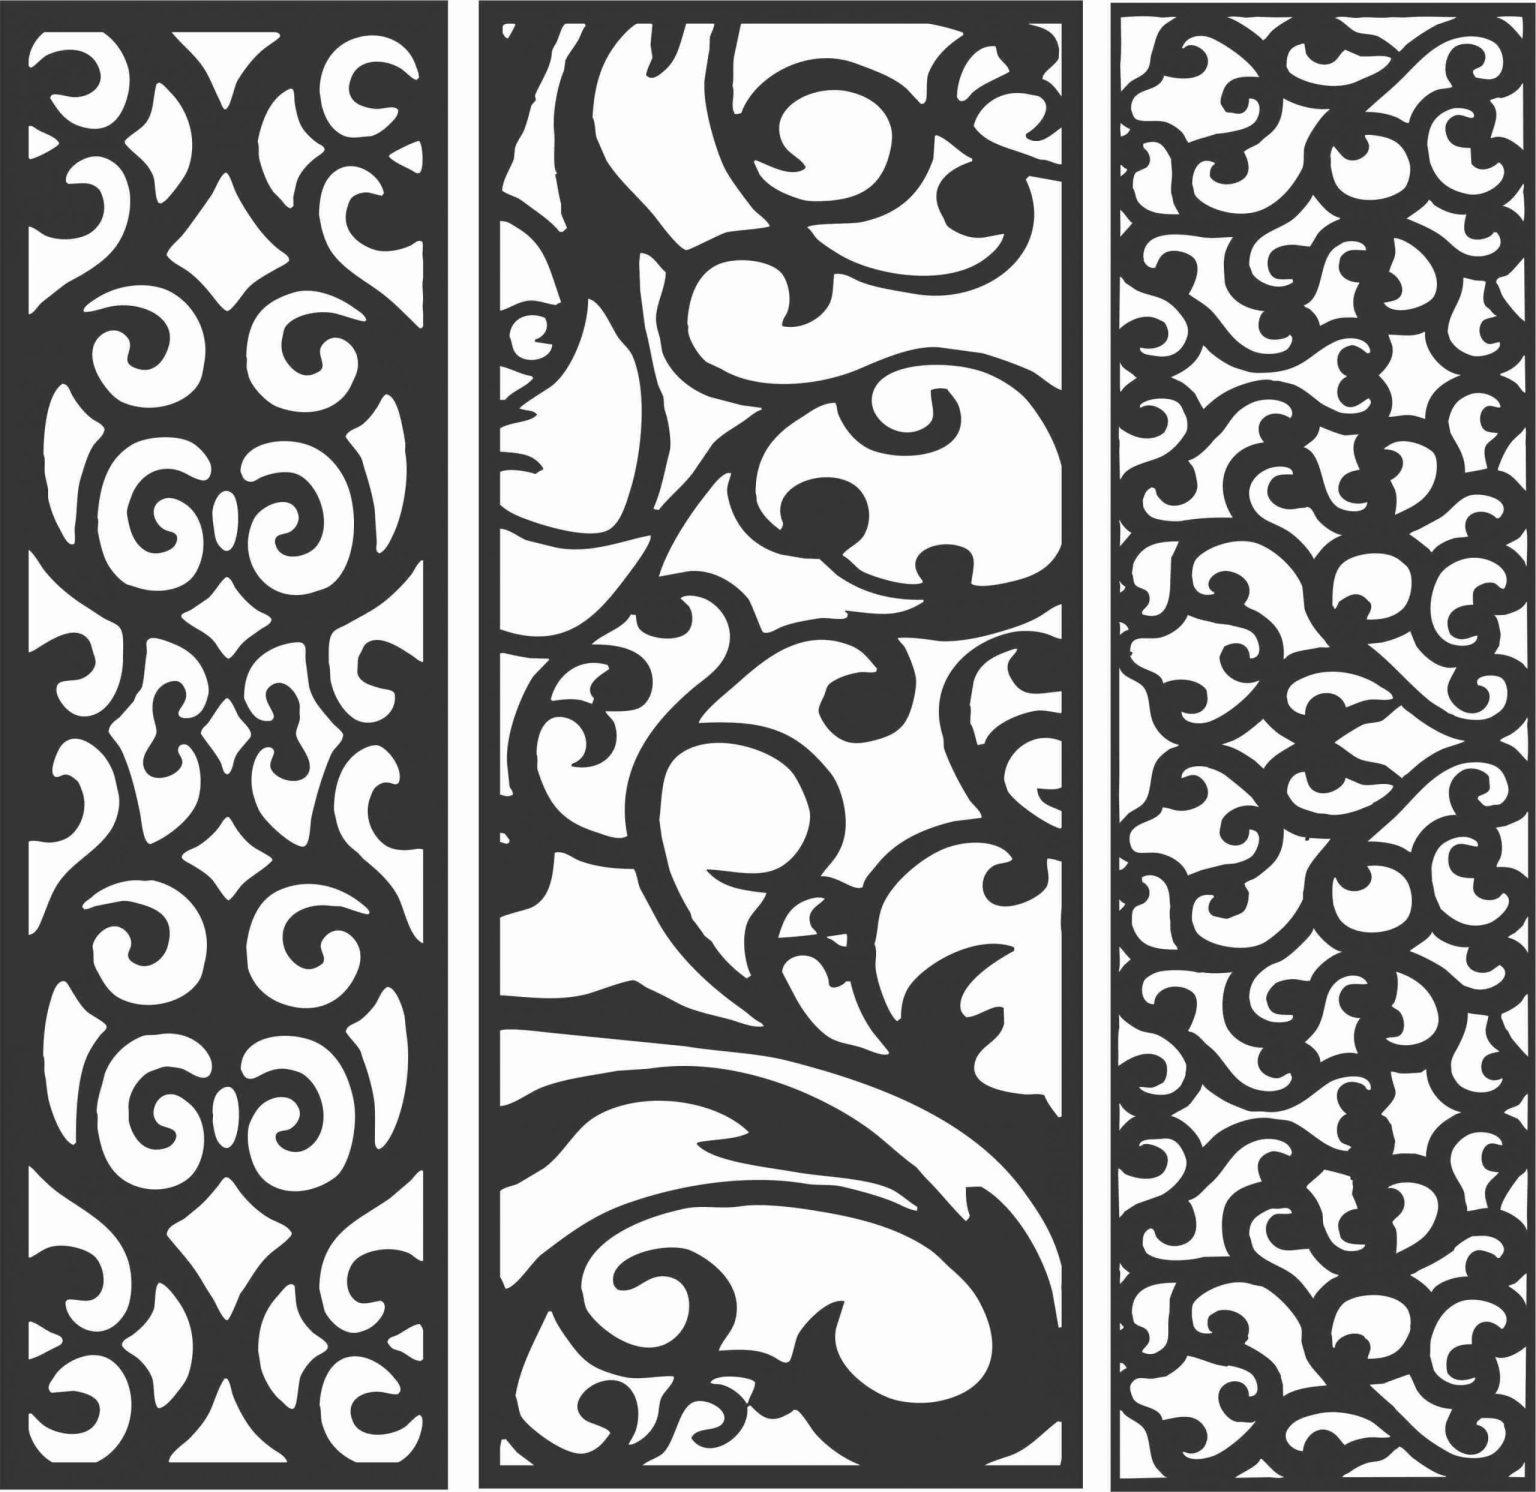 Screen Panel Patterns Seamless 68 Free DXF File